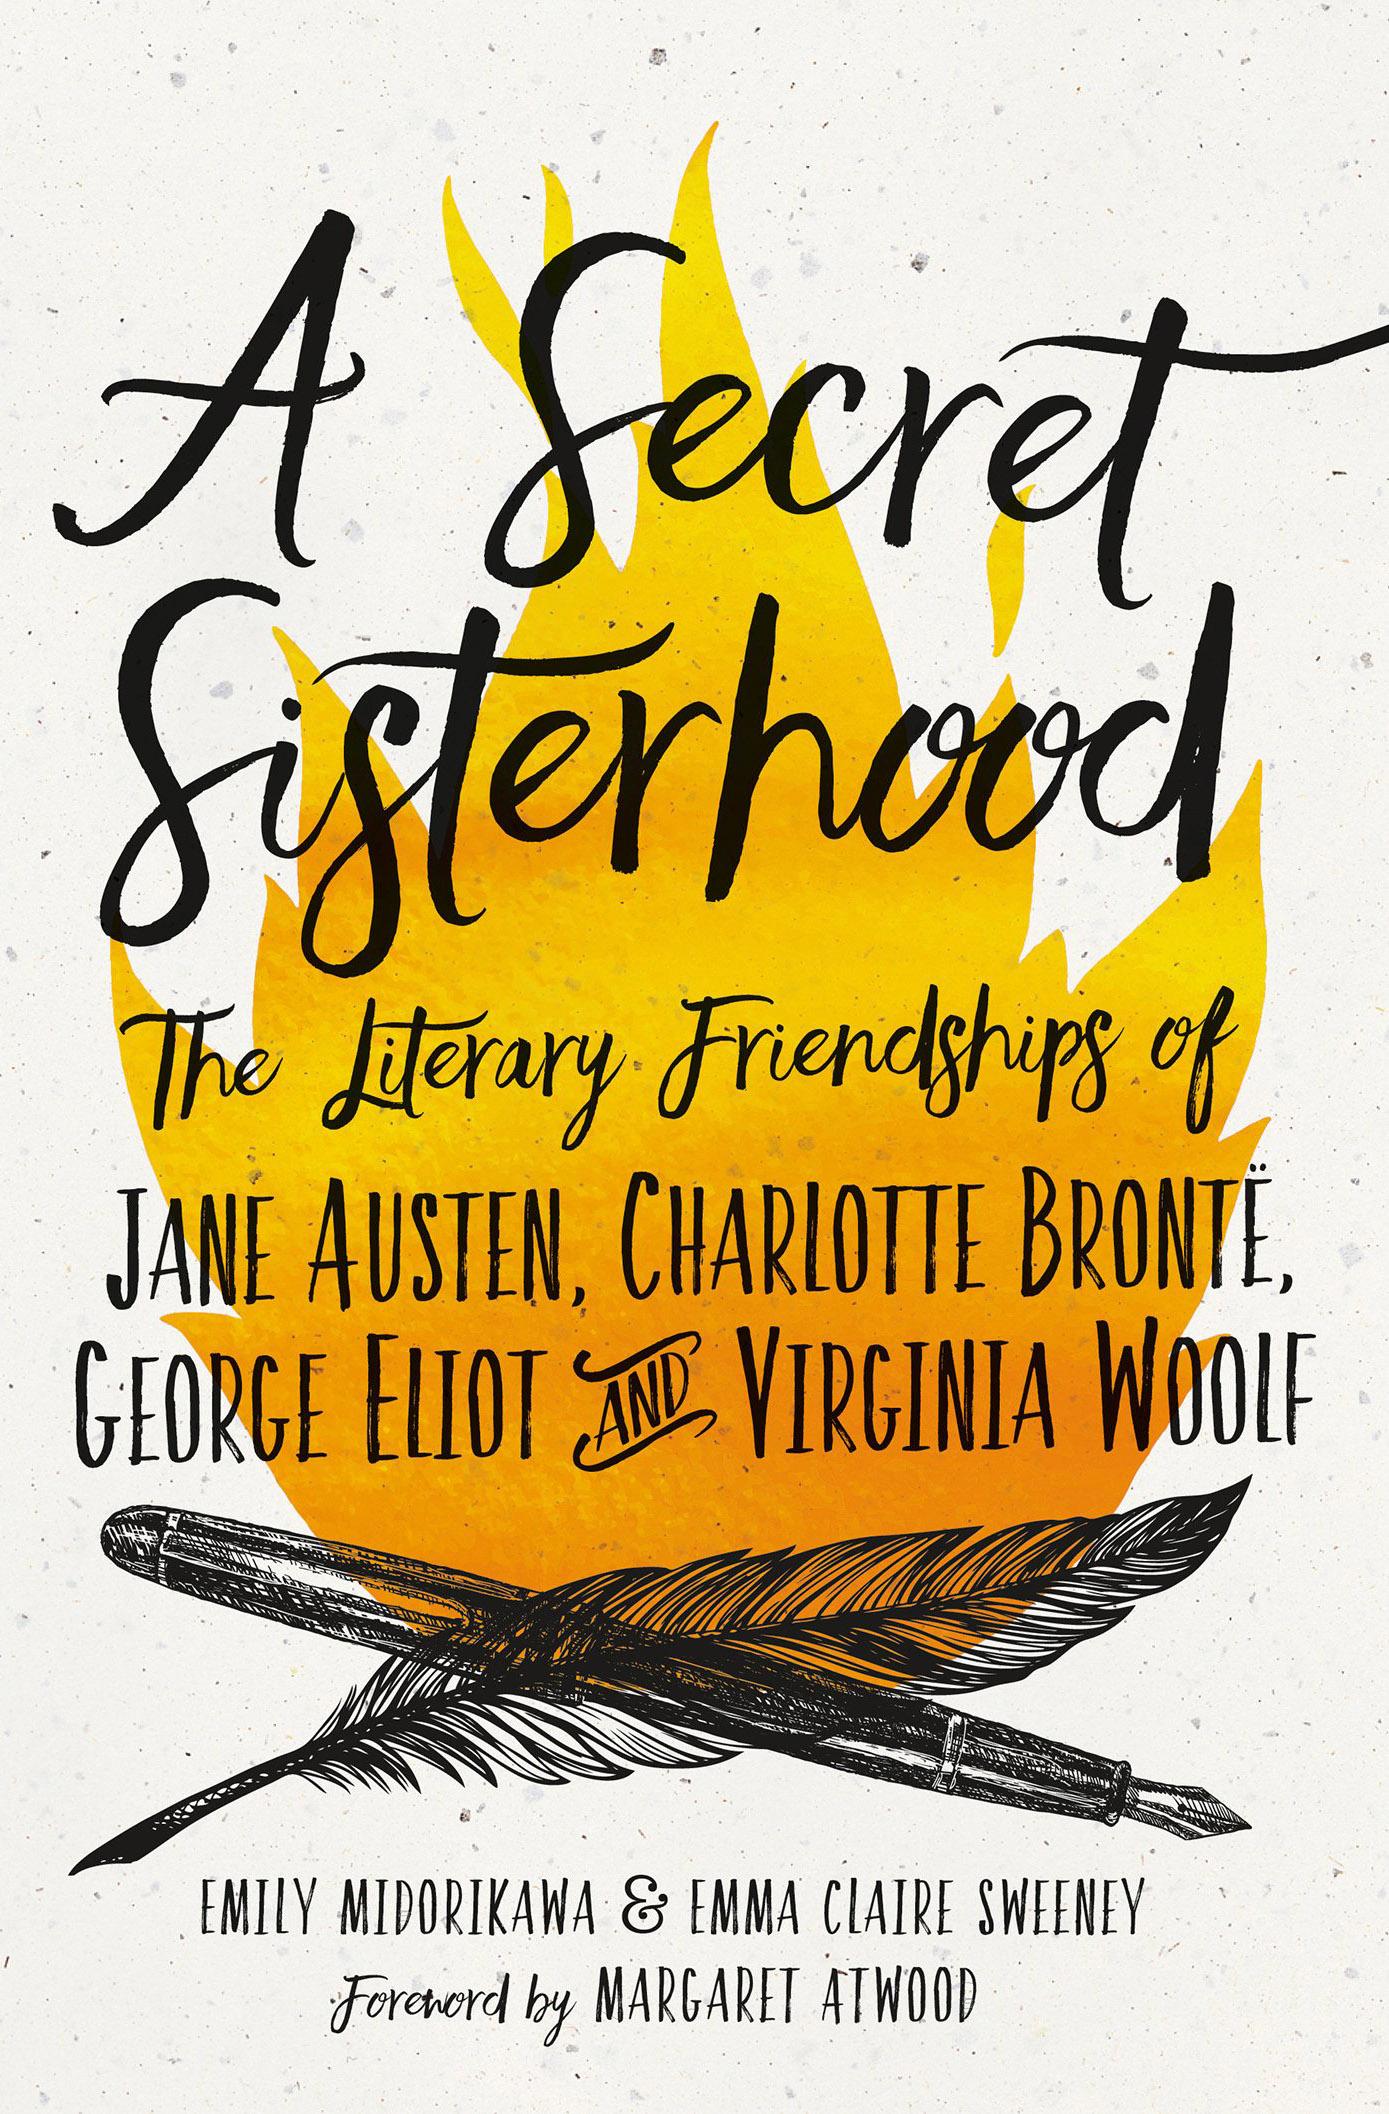 Cover Design: Jackie Shepherd